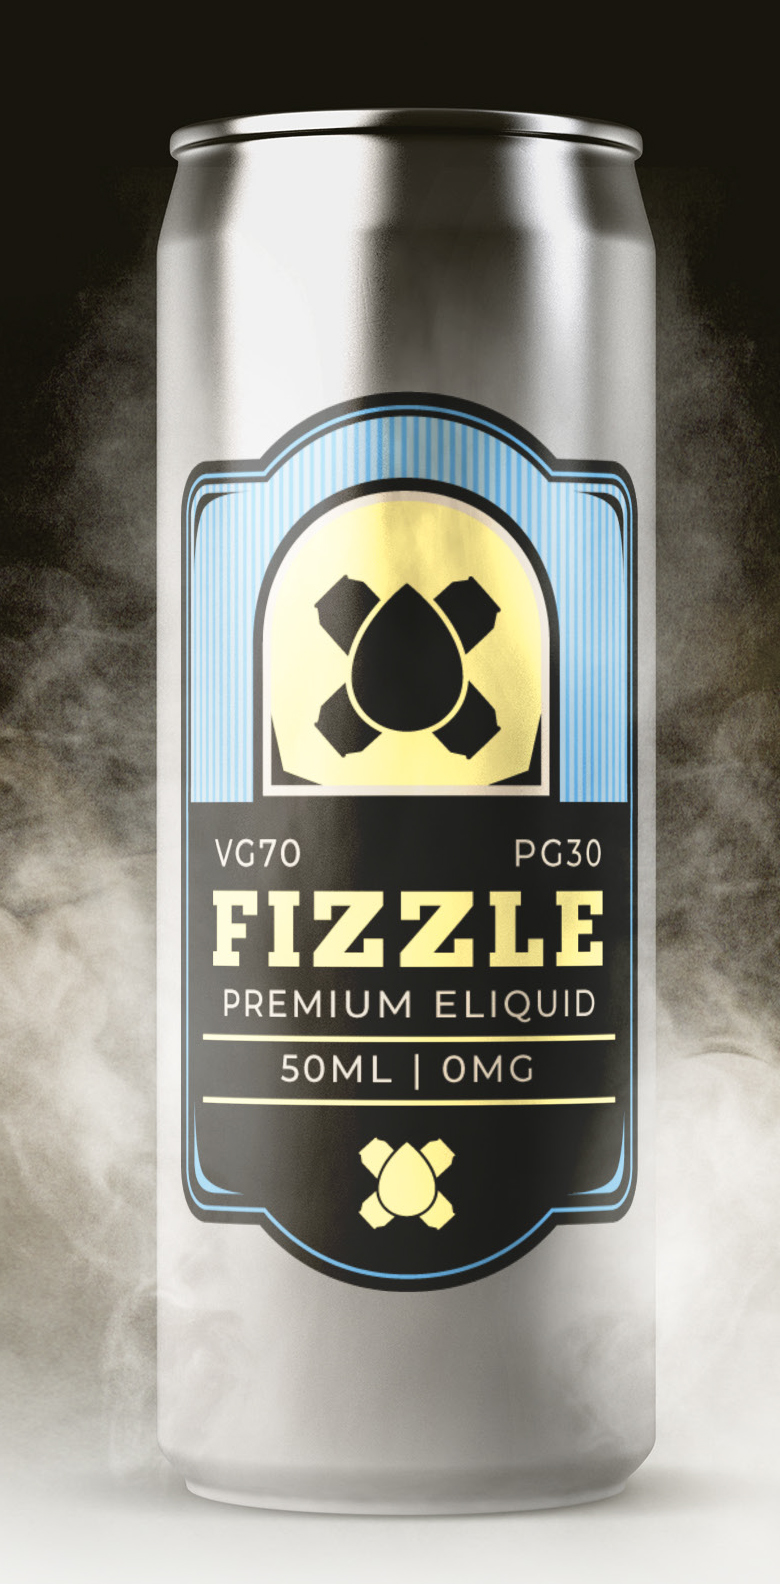 Fizzle E Liquid _Cirencester Vape Co Sho